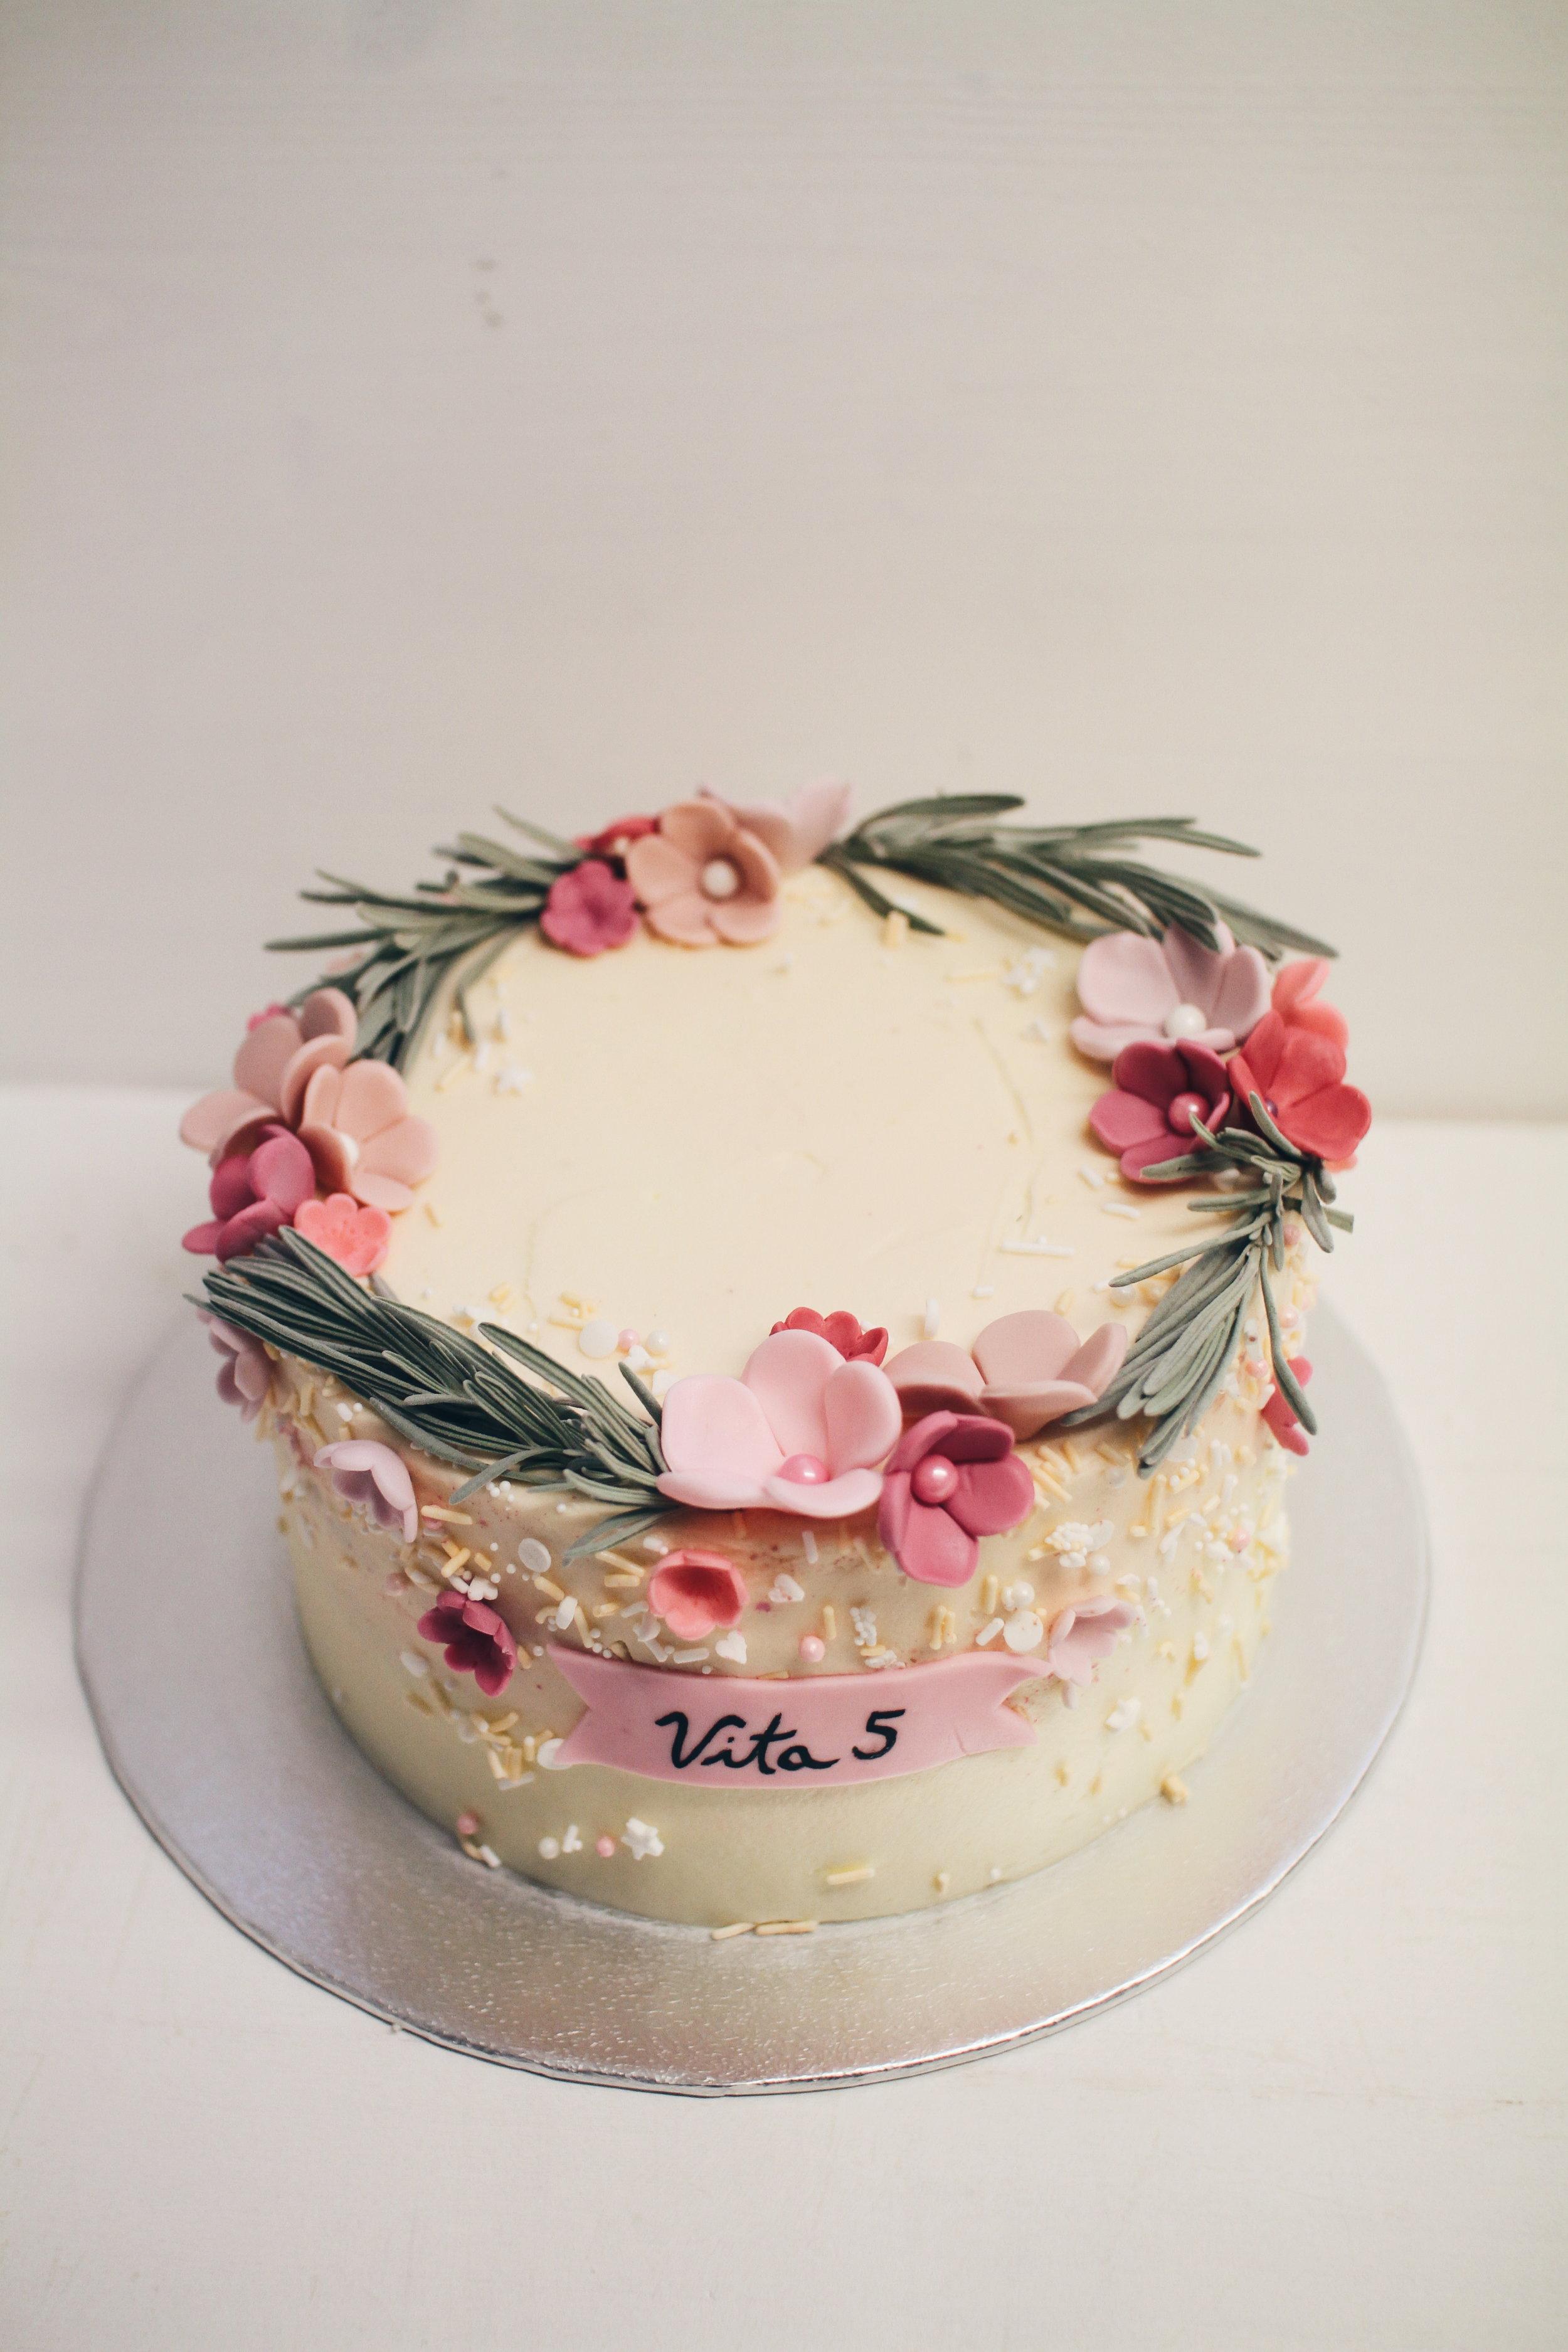 Copy of Pomladna otroška torta.